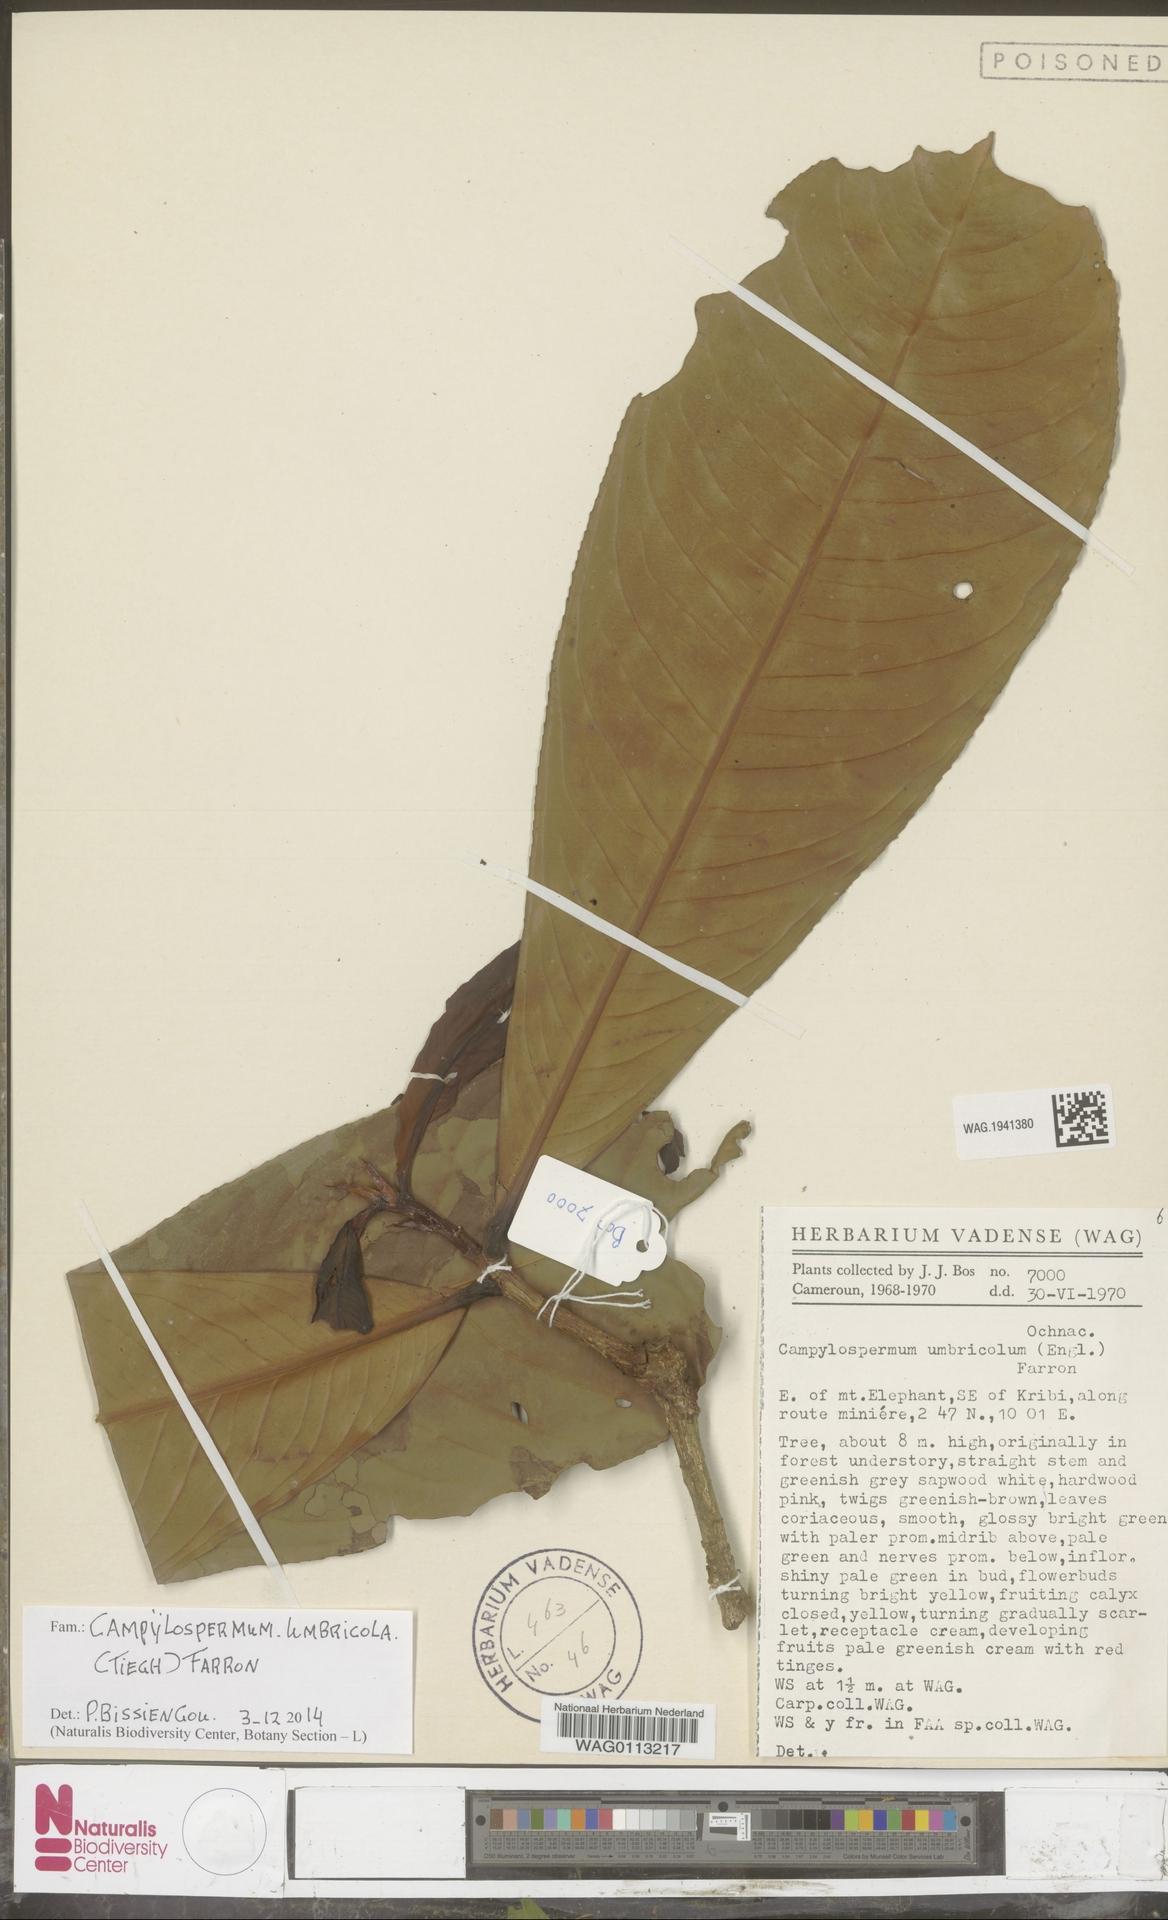 WAG.1941380 | Campylospermum umbricola (Tiegh.) Farron